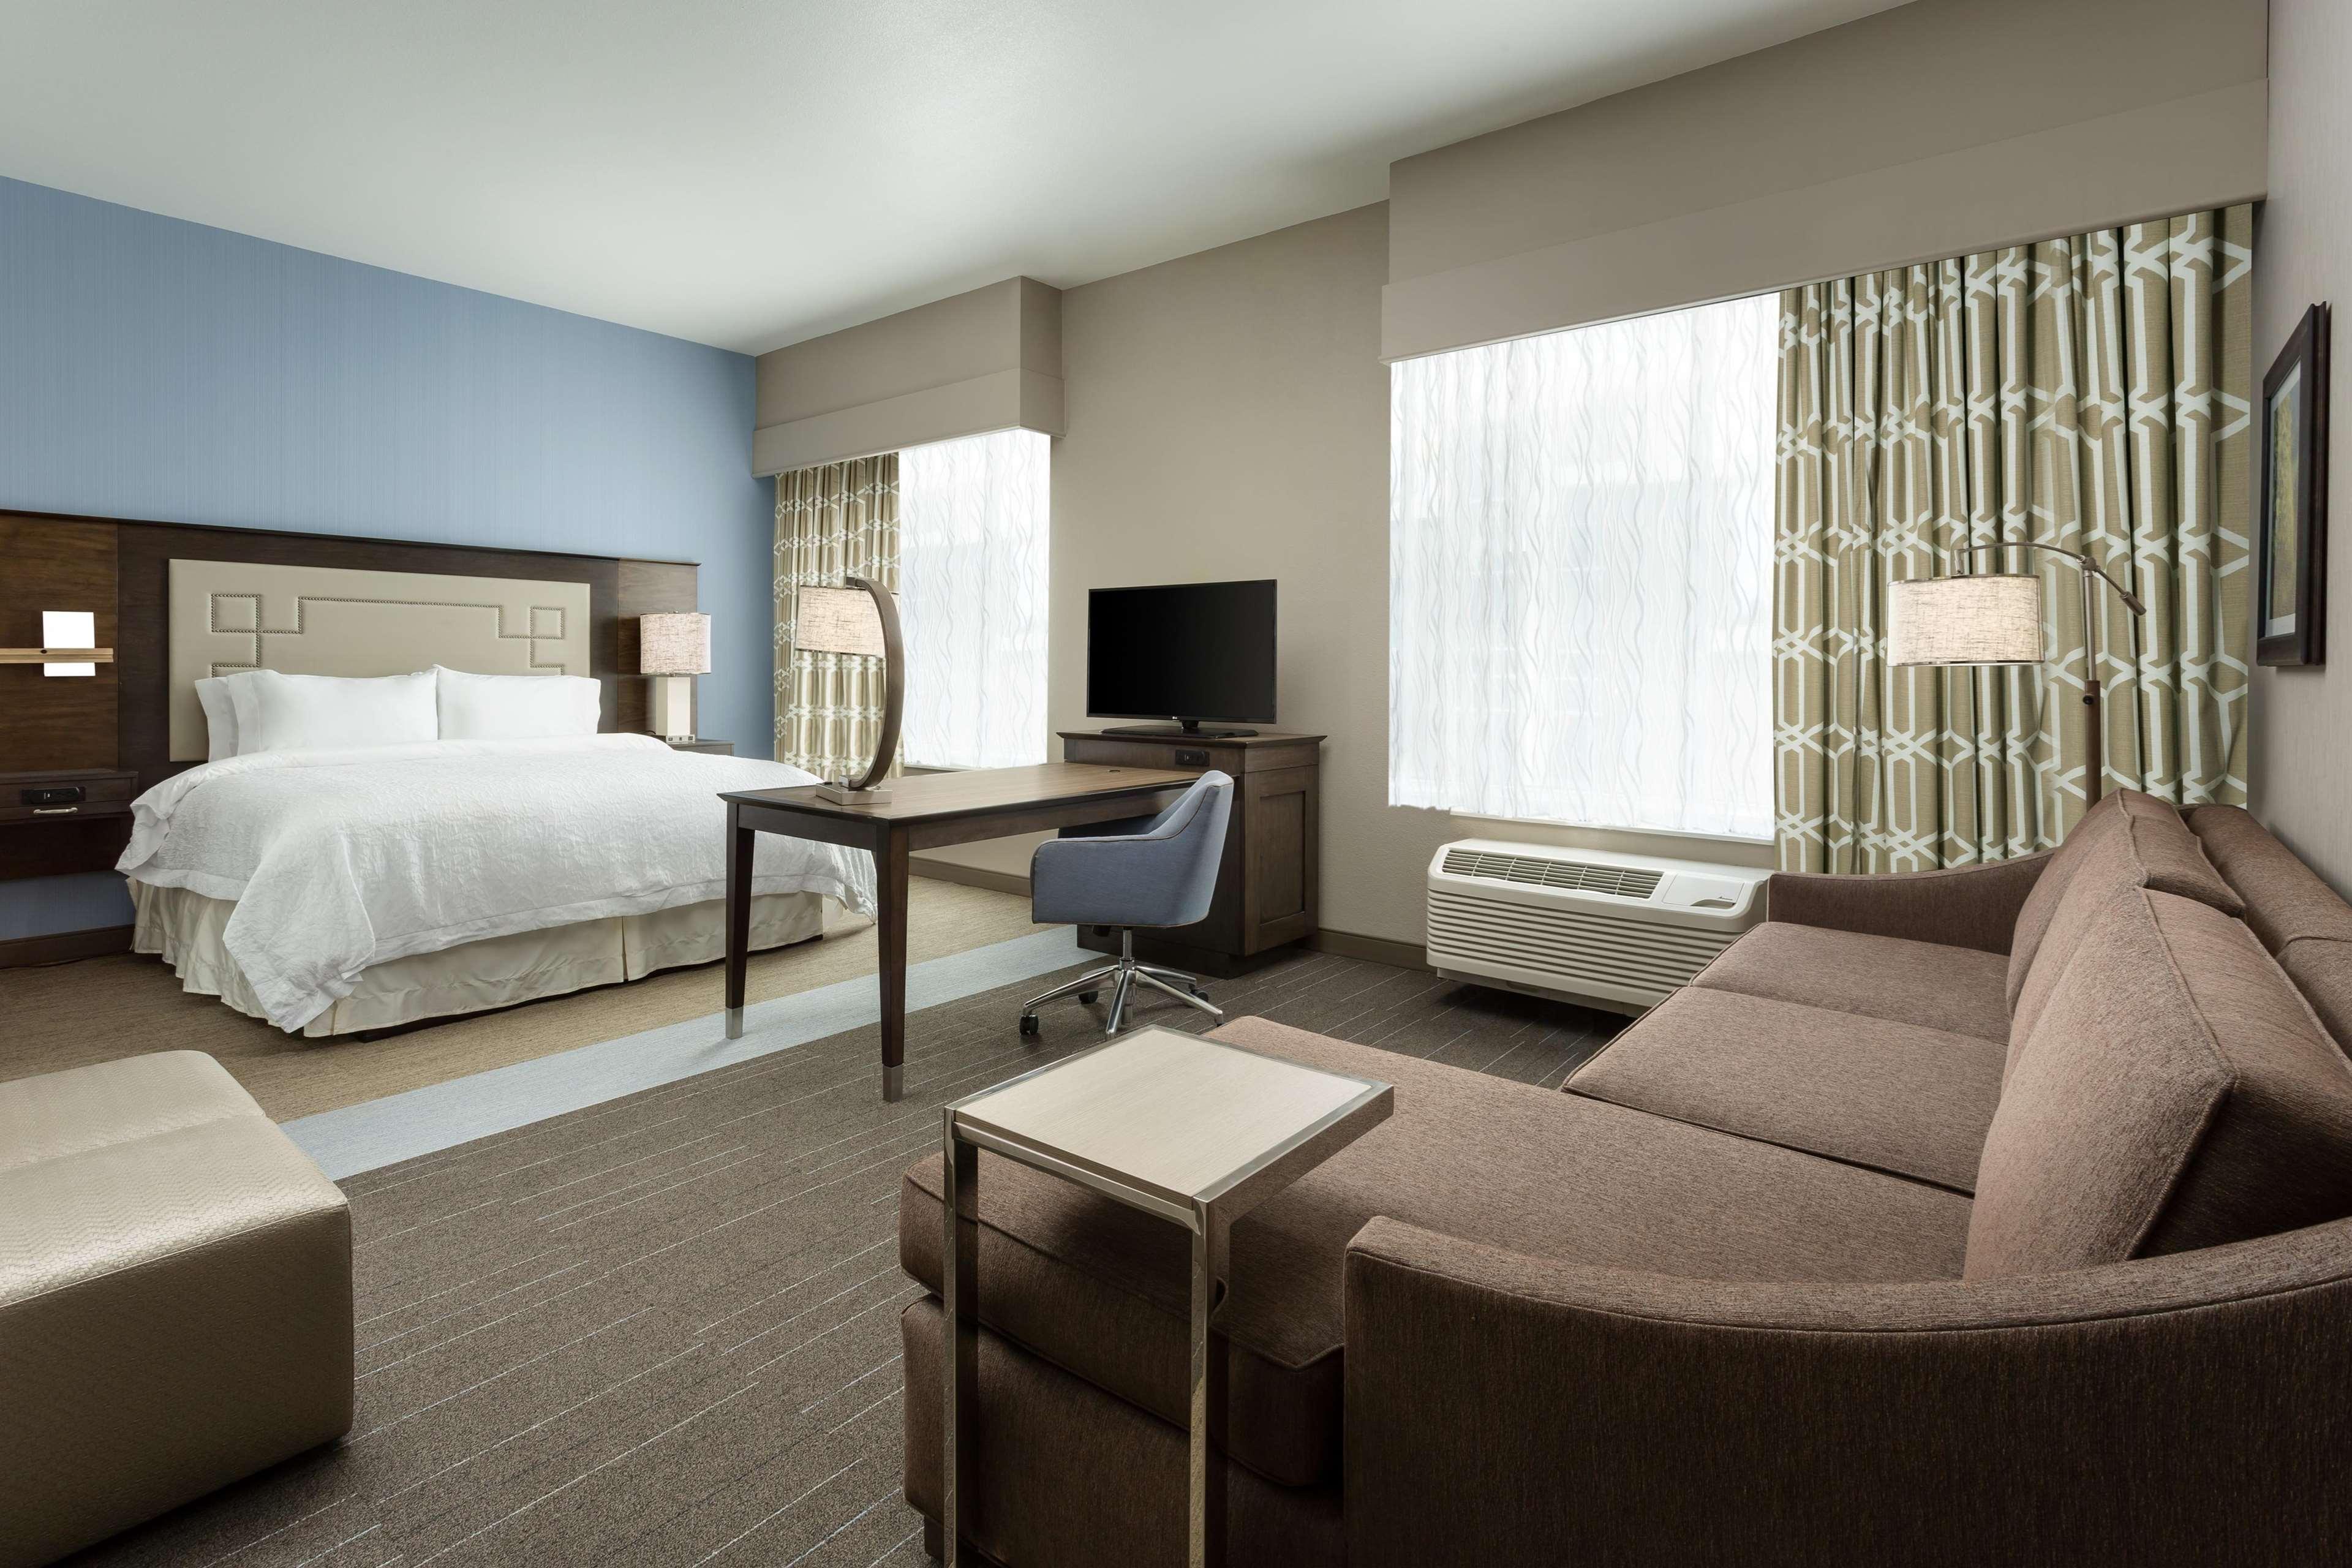 Hampton Inn & Suites Napa image 4